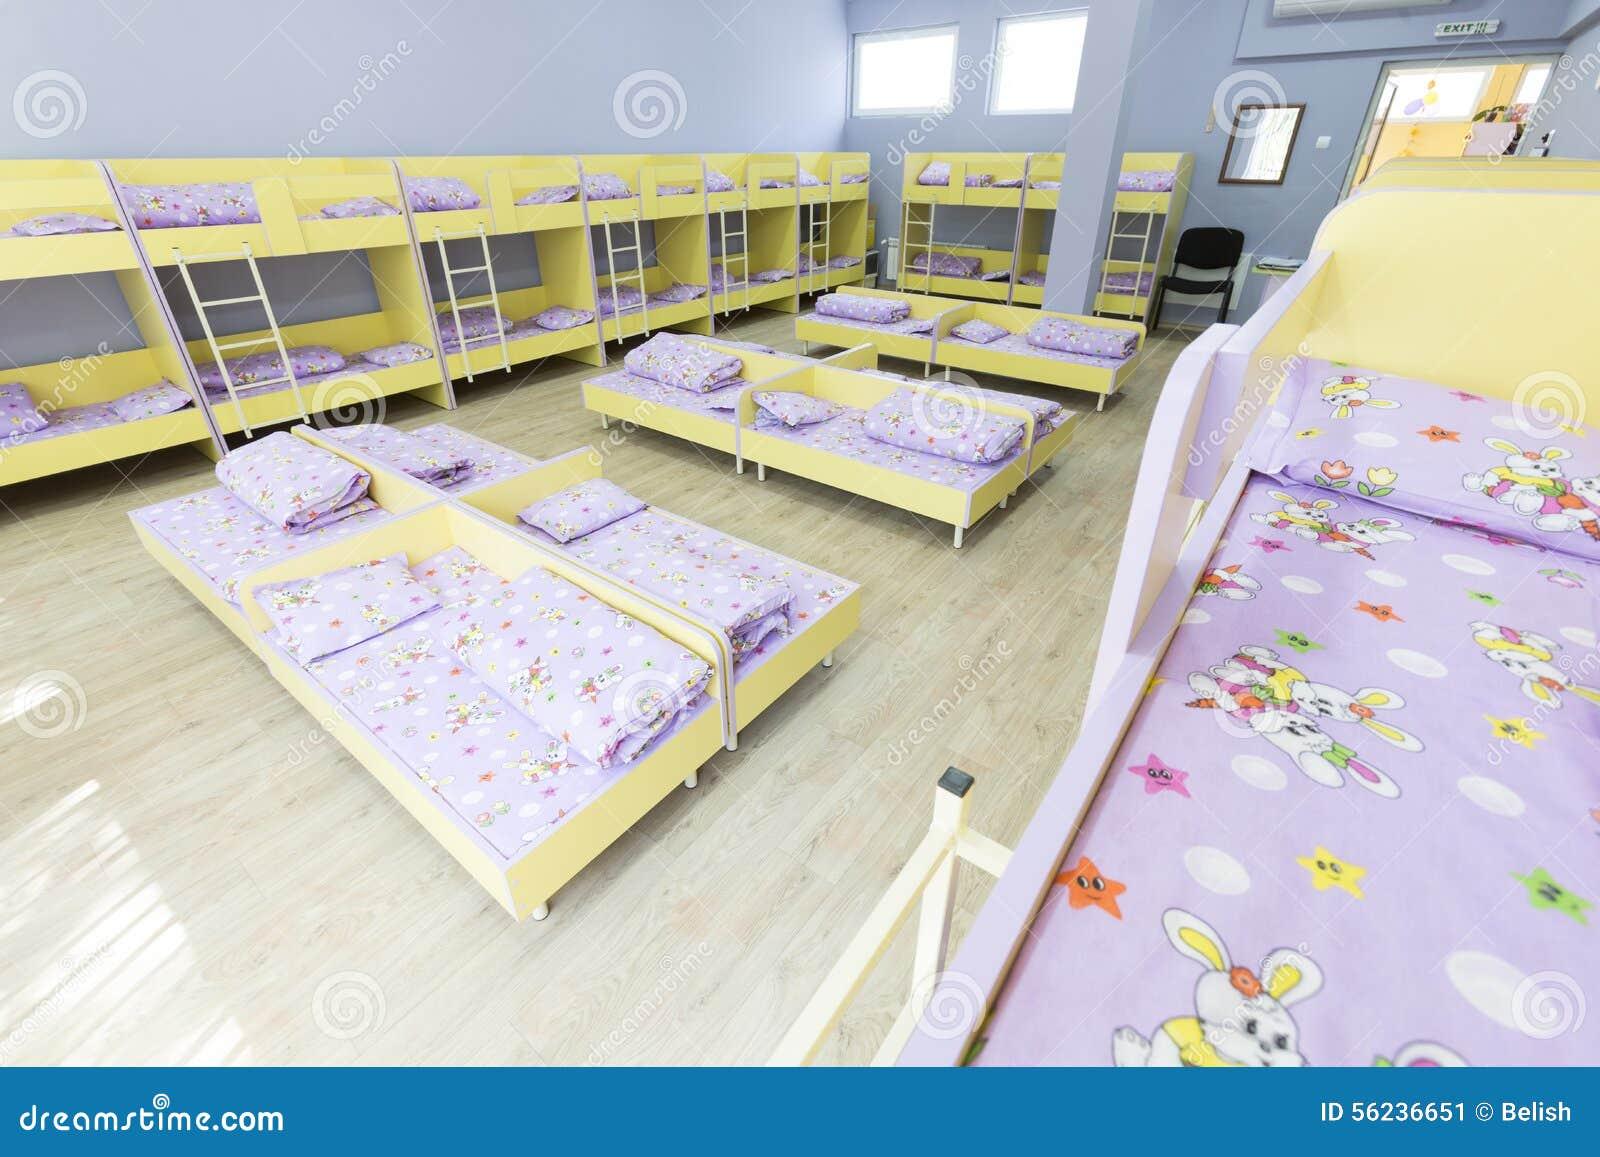 Modern Kindergarten Bedroom With Small Beds Stock Image